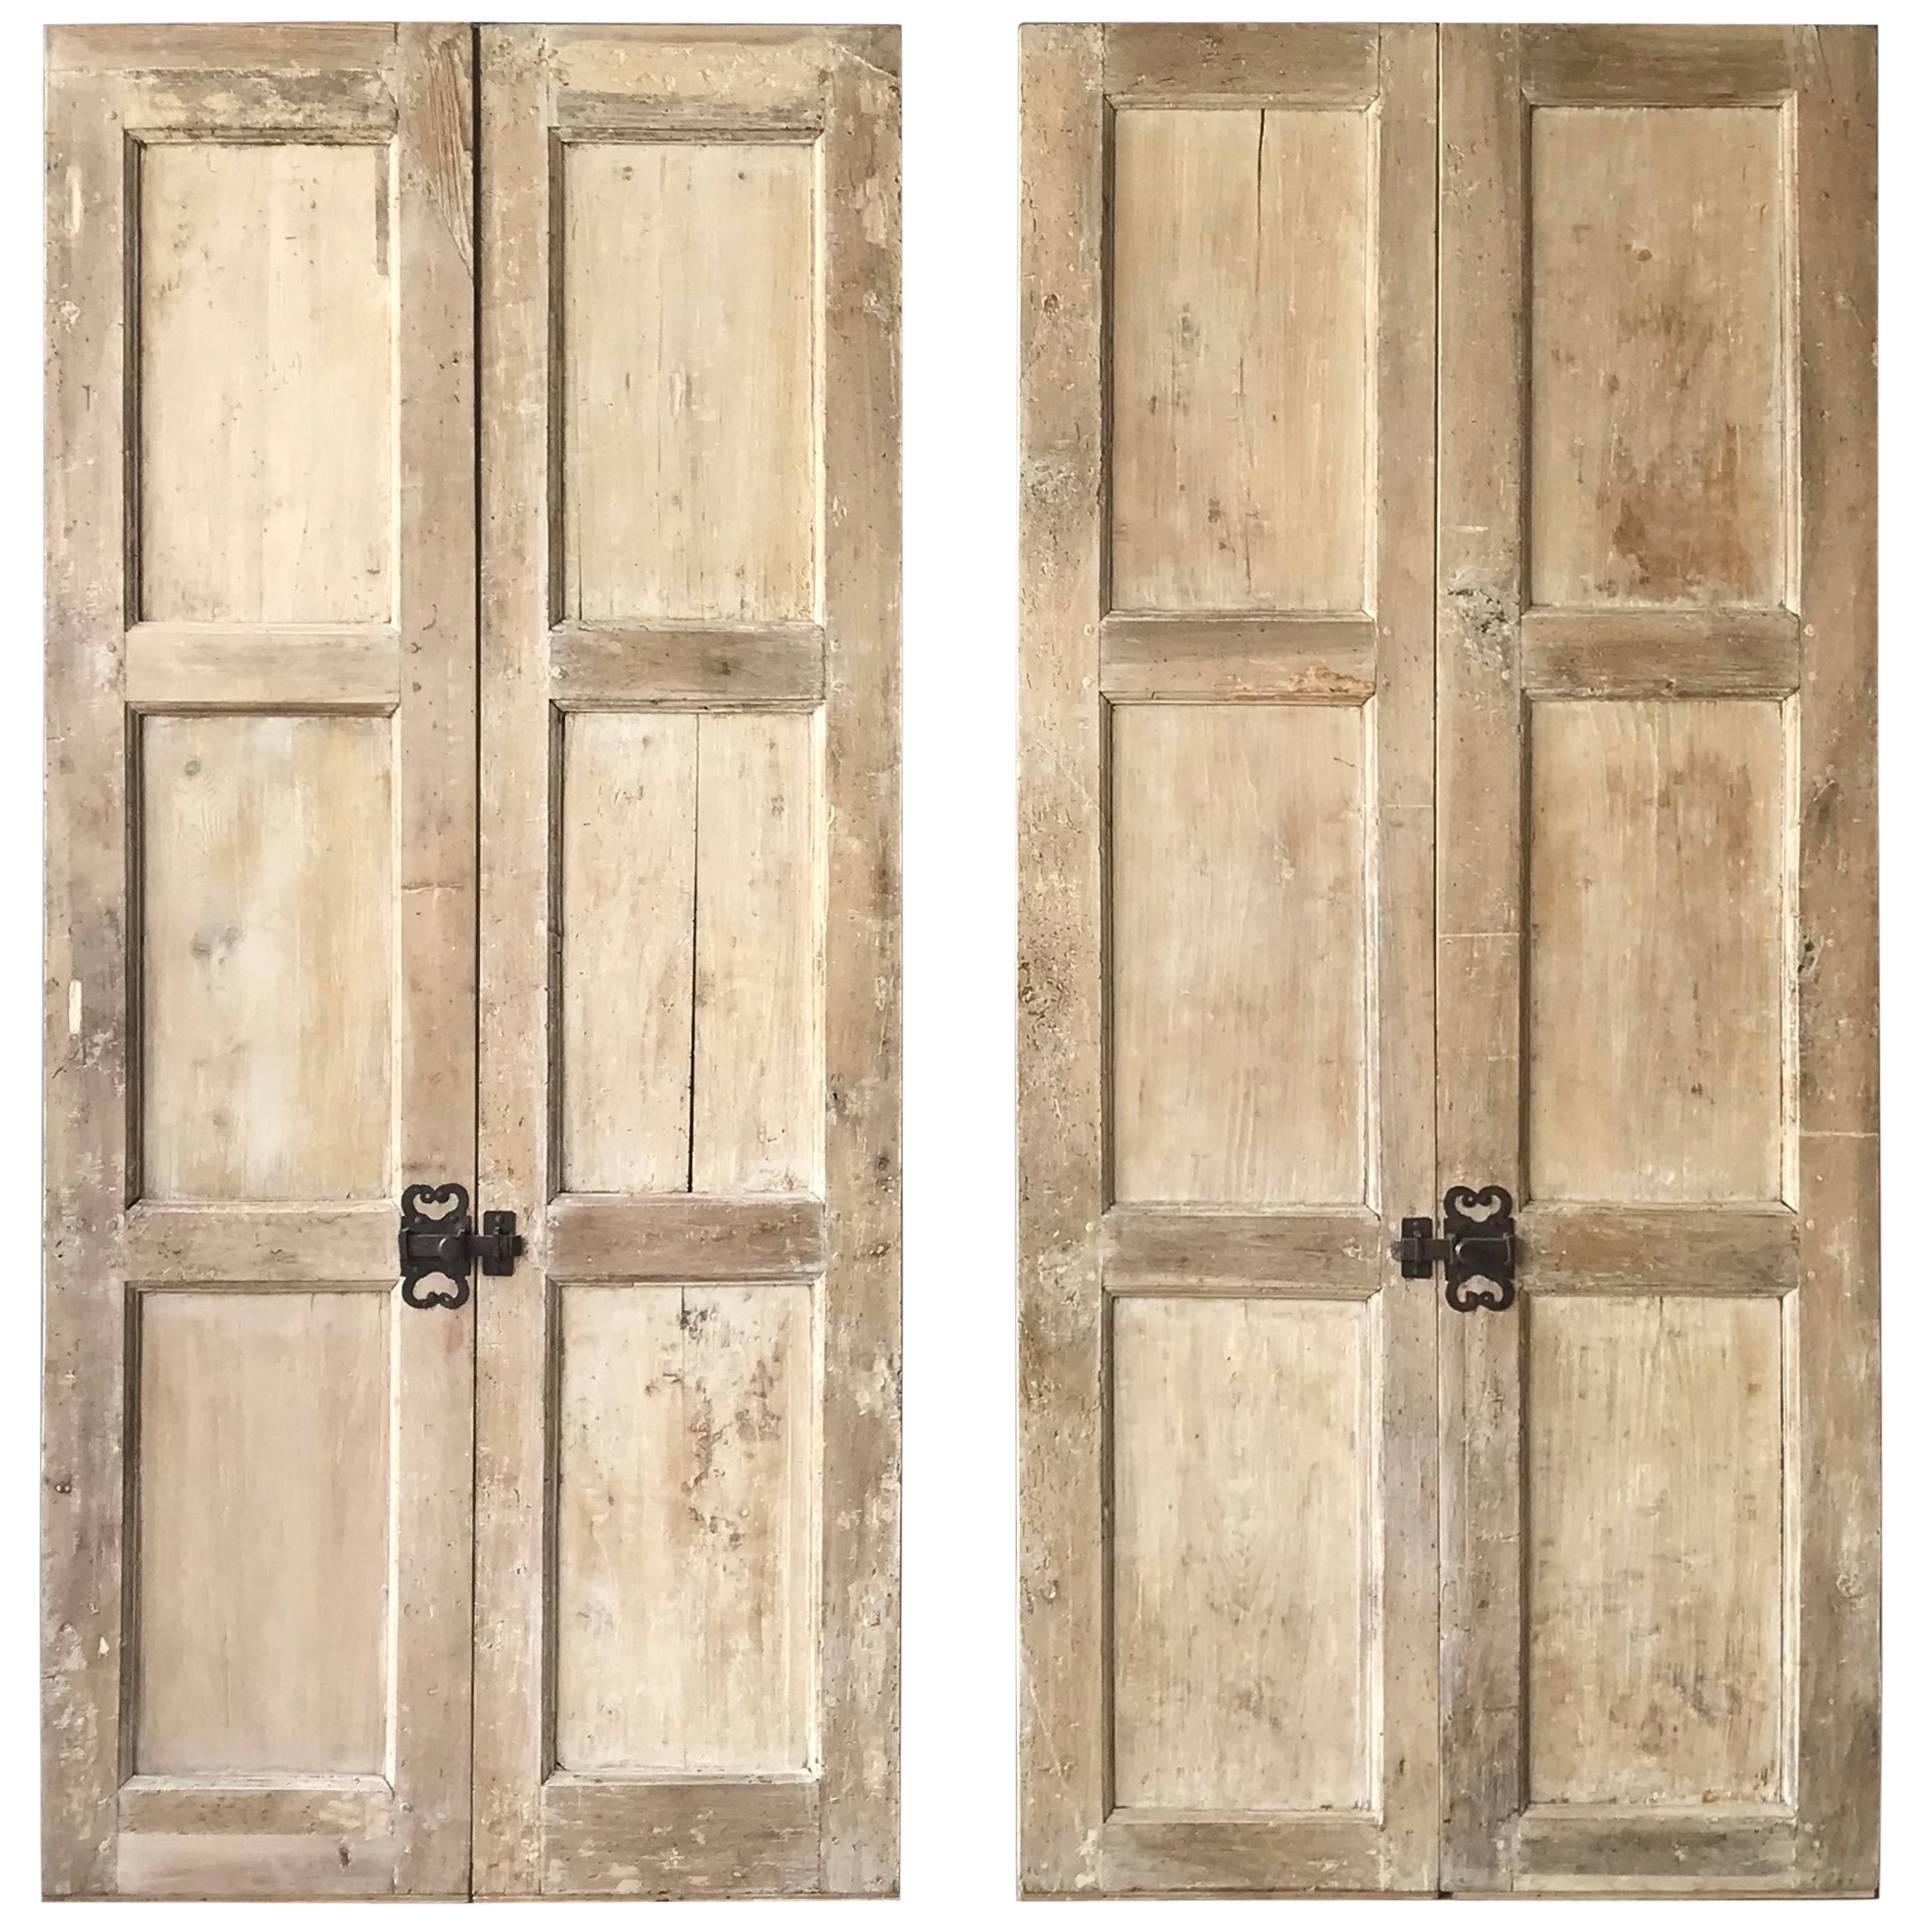 Set of Two 17th Century Walnut and Poplar Doors For Sale & Set of Two 17th Century Walnut and Poplar Doors at 1stdibs